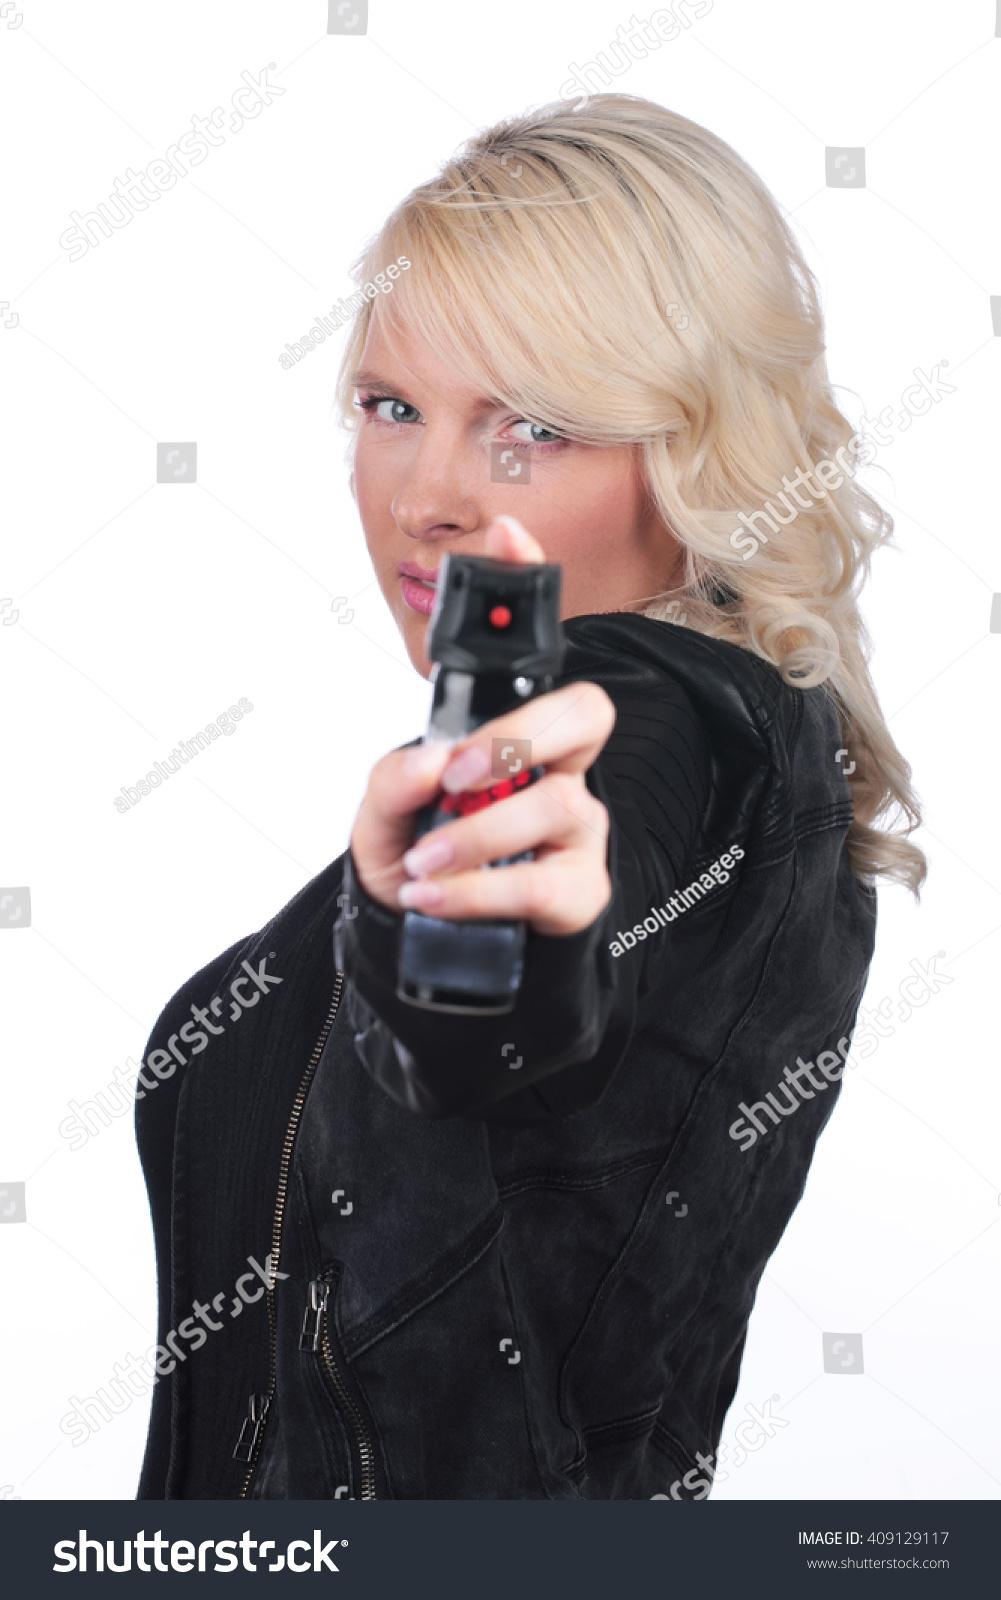 Woman Pepper Spray